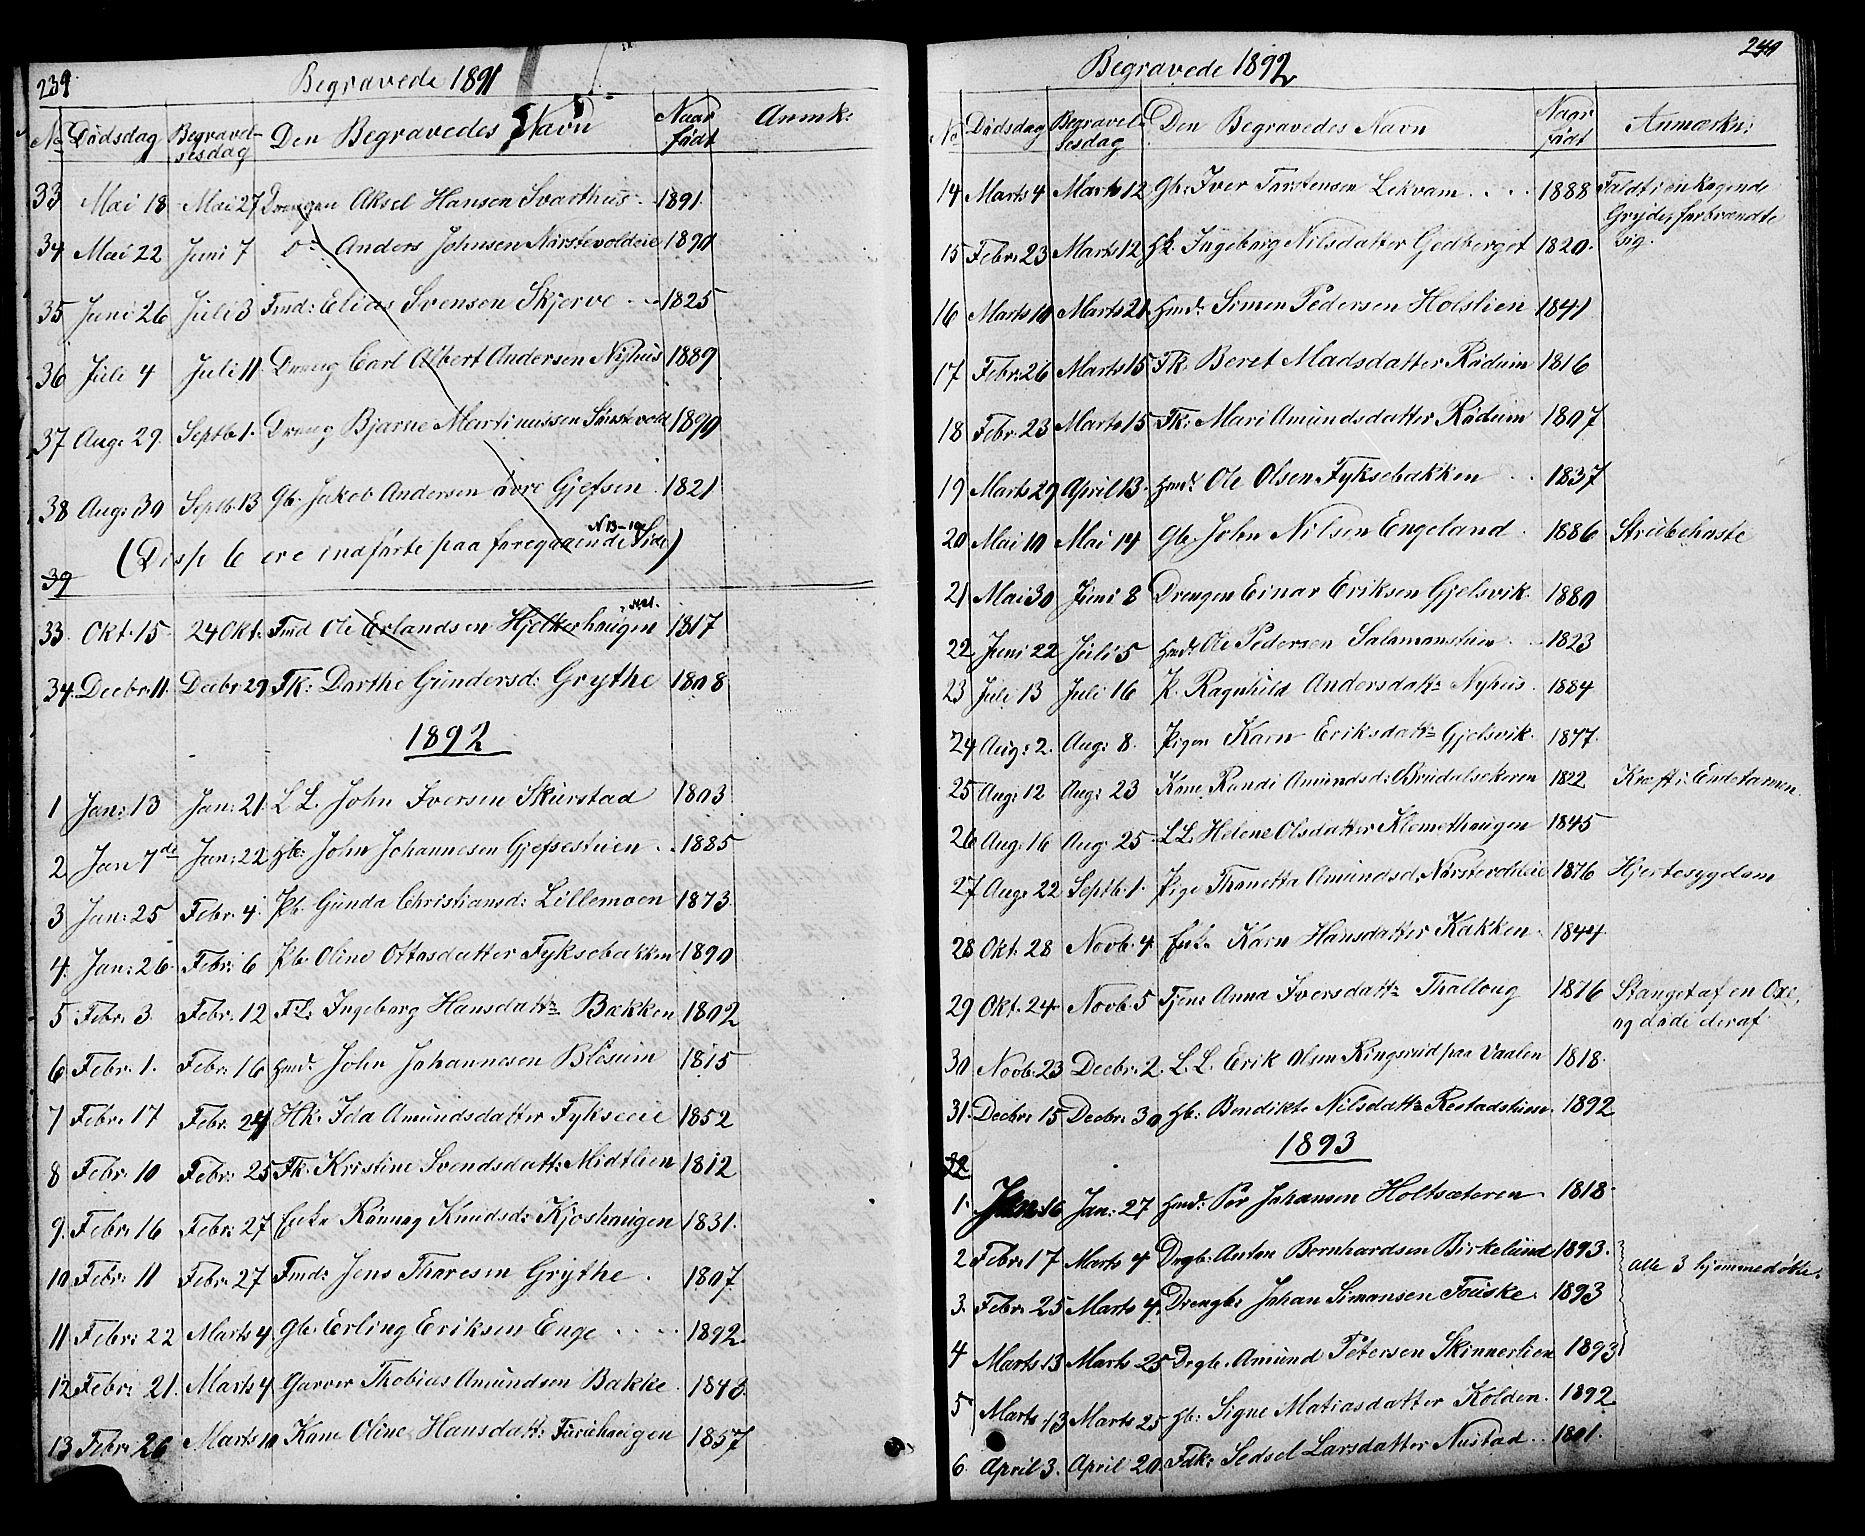 SAH, Østre Gausdal prestekontor, Klokkerbok nr. 1, 1863-1893, s. 239-240